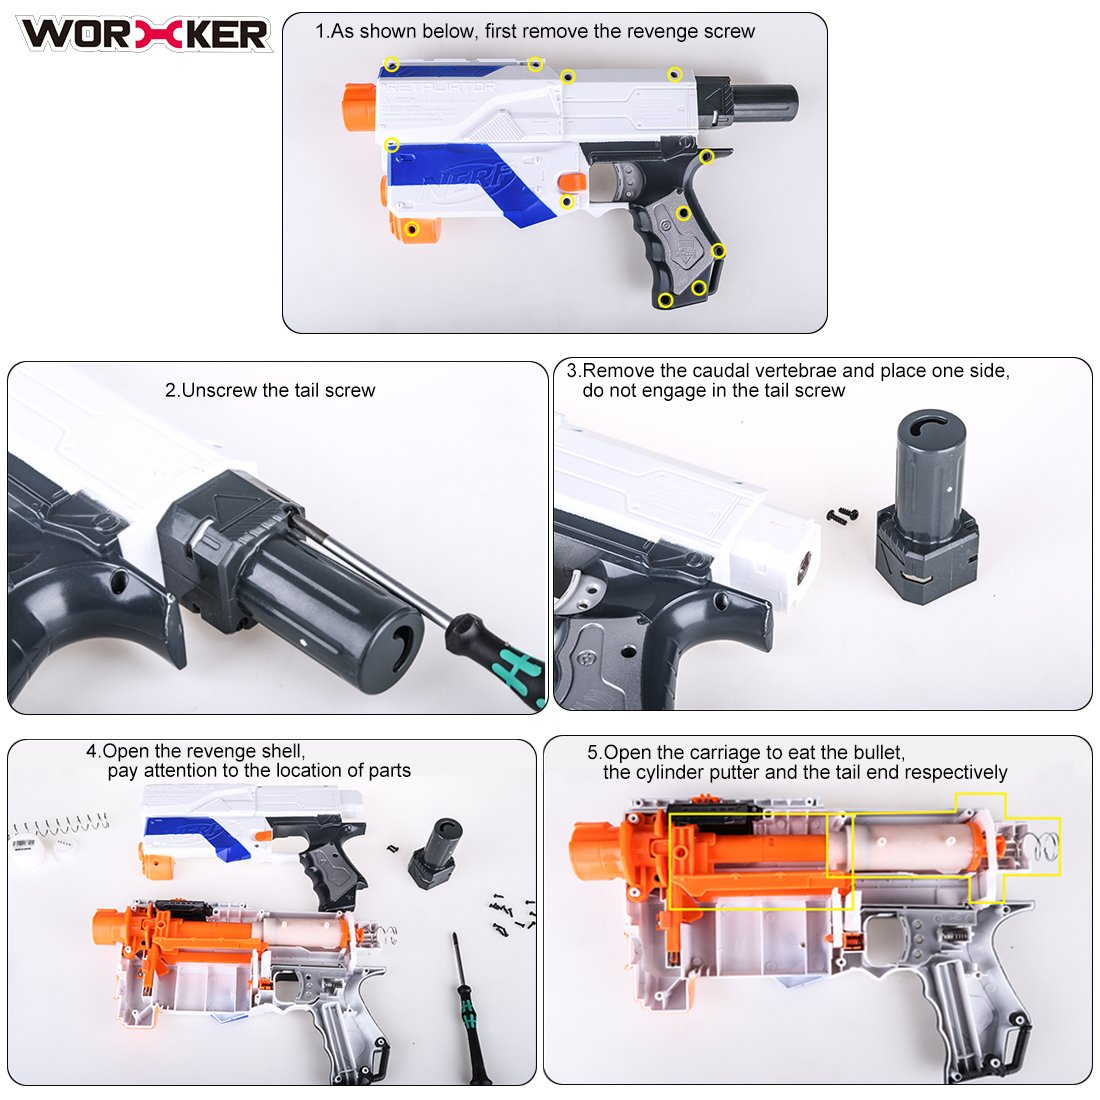 Amazon.com: Upgrade Spring, Yamix Worker 12KG Modification Upgrade Spring Kit for nerf n-strike elite retaliator - Silver: Toys & Games